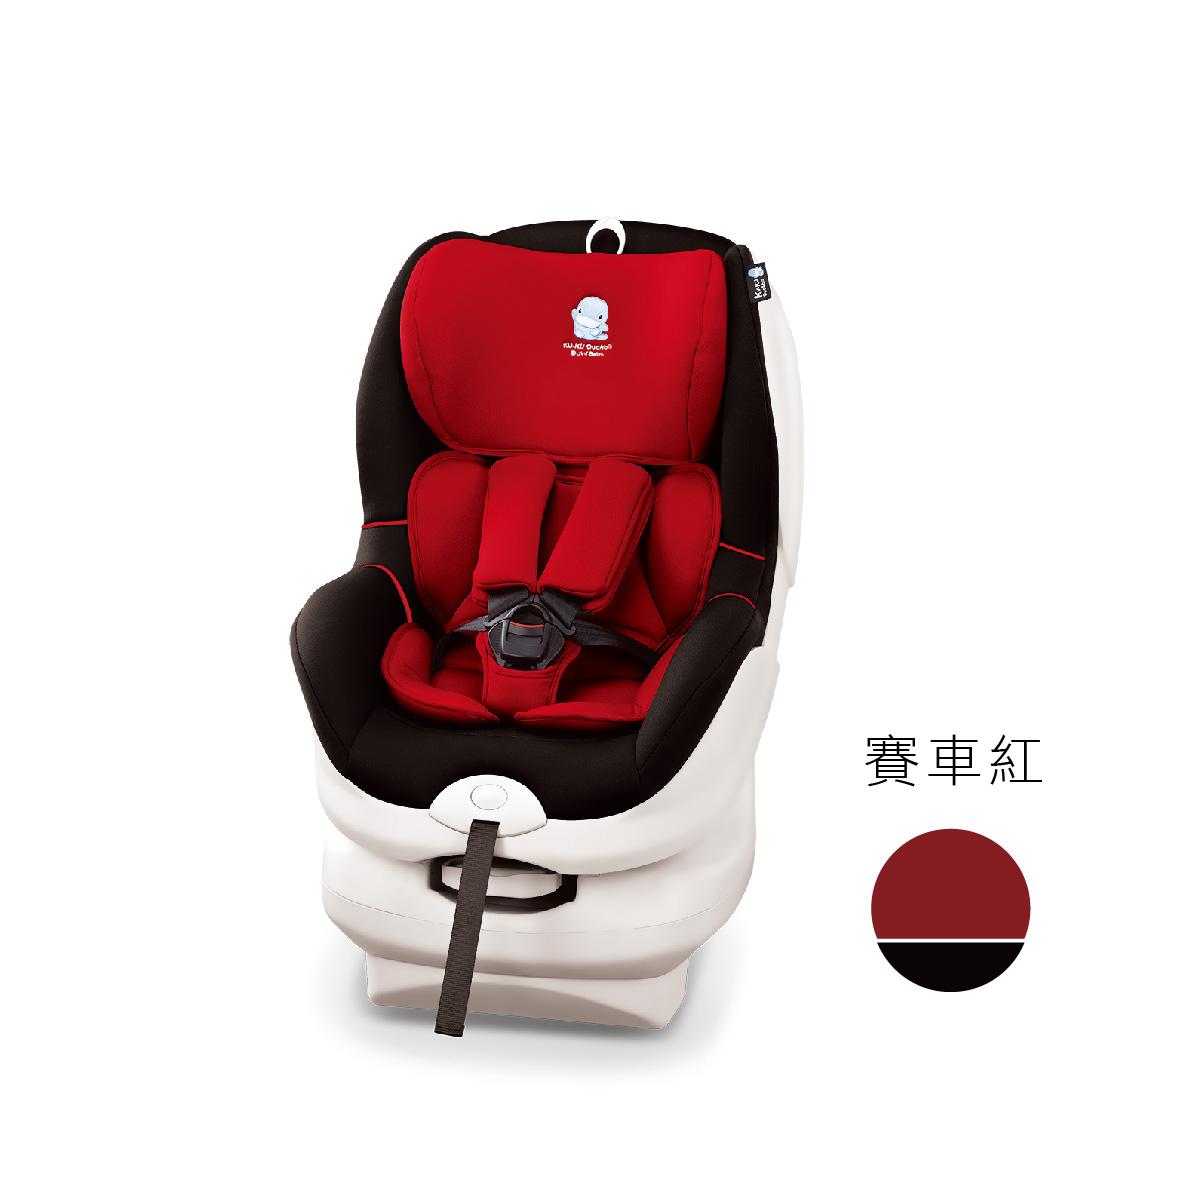 proimages/Tip_Accessories_Series/safety_seat/6039/6039_EDM_1200x1200-3-22.jpg